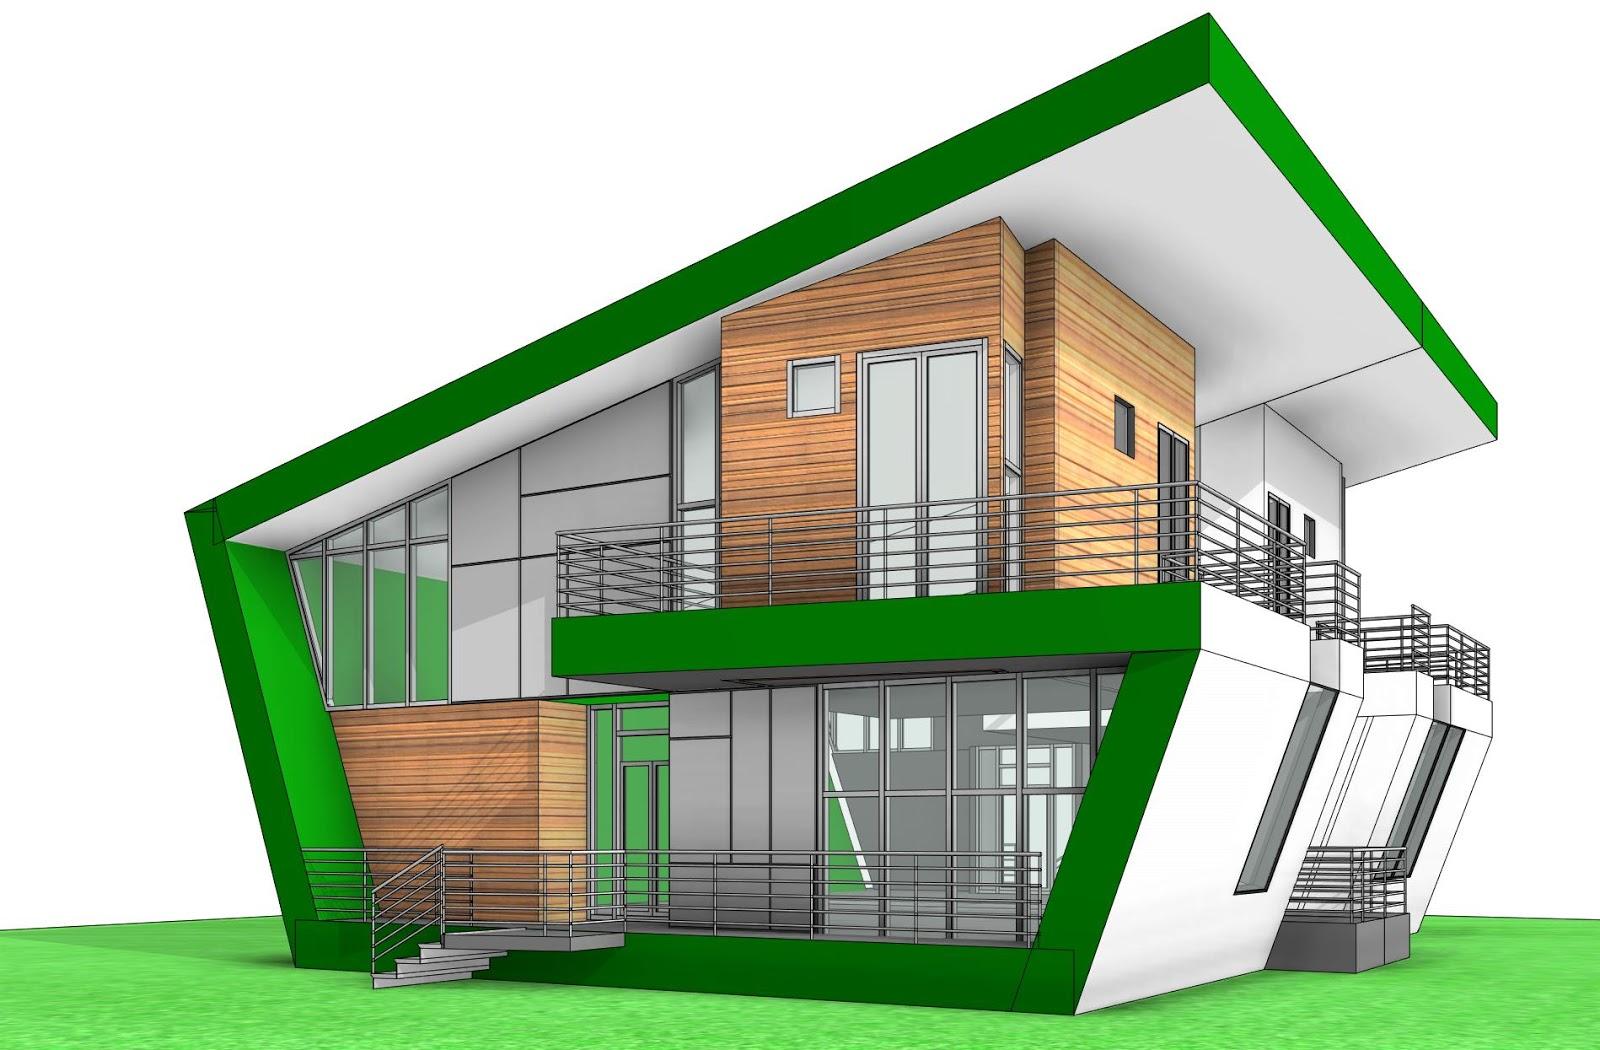 Revit Complete Project #22   Modeling Gorki House In Revit   Atrium